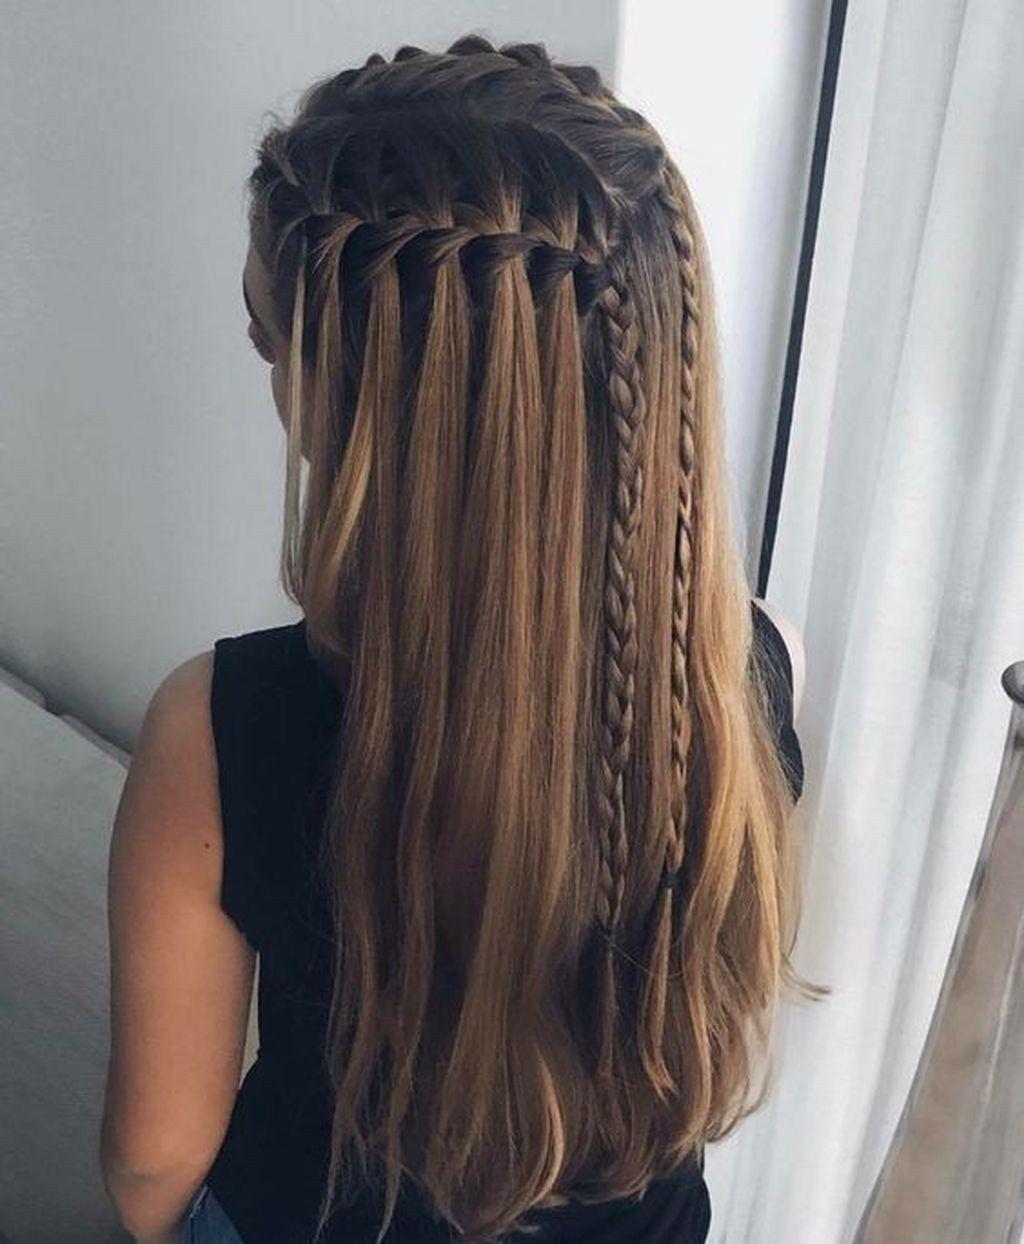 35 Fabulous Braid Hairstyle Ideas For Girls Nowadays Waterfall Braid Hairstyle Braided Hairstyles Curly Hair Styles